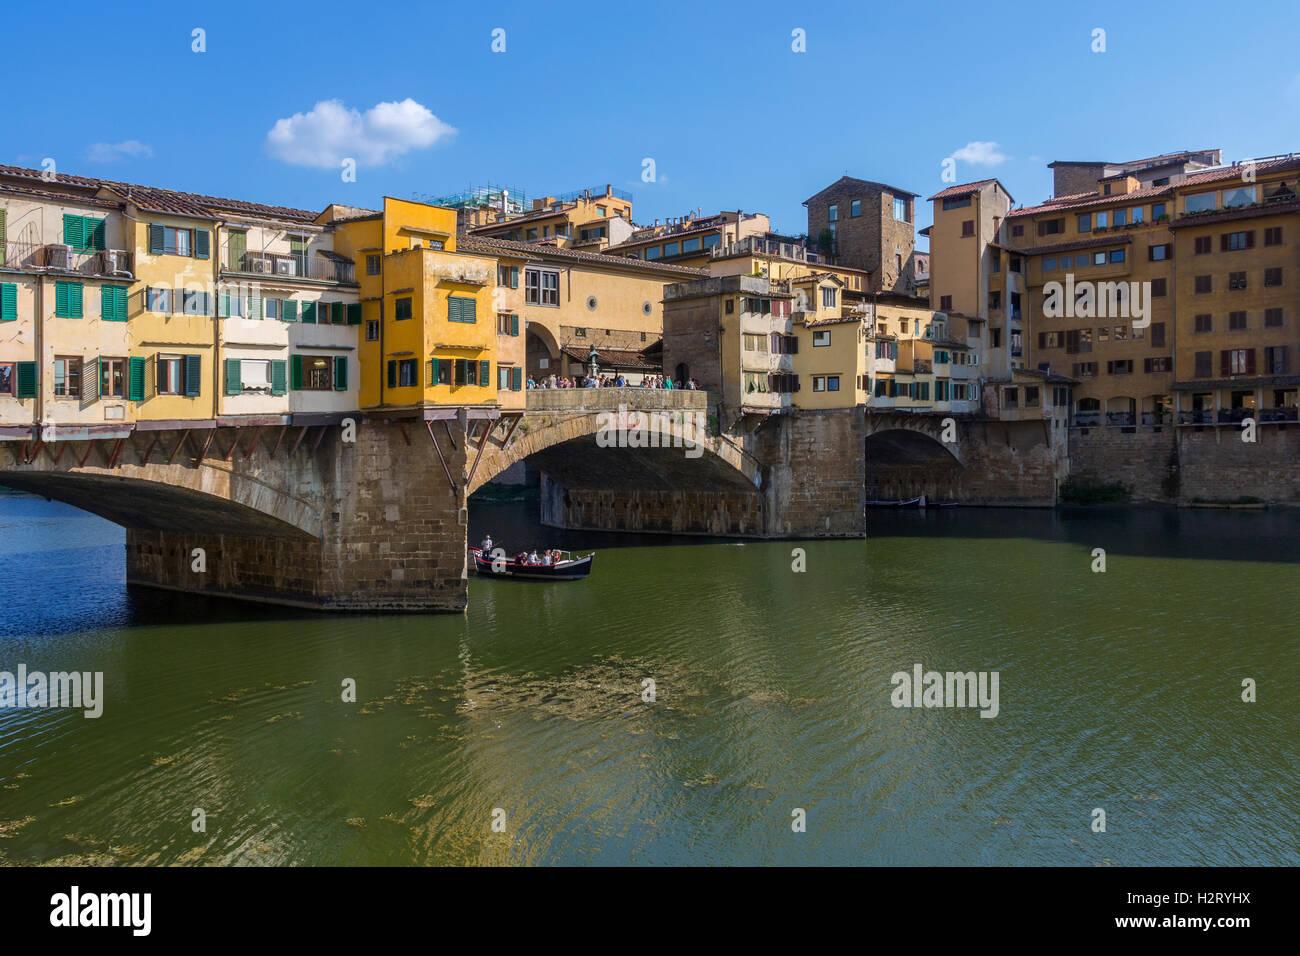 Florence, Italy - The Ponte Vecchio (Old Bridge] - a Medieval stone bridge over the Arno River. - Stock Image